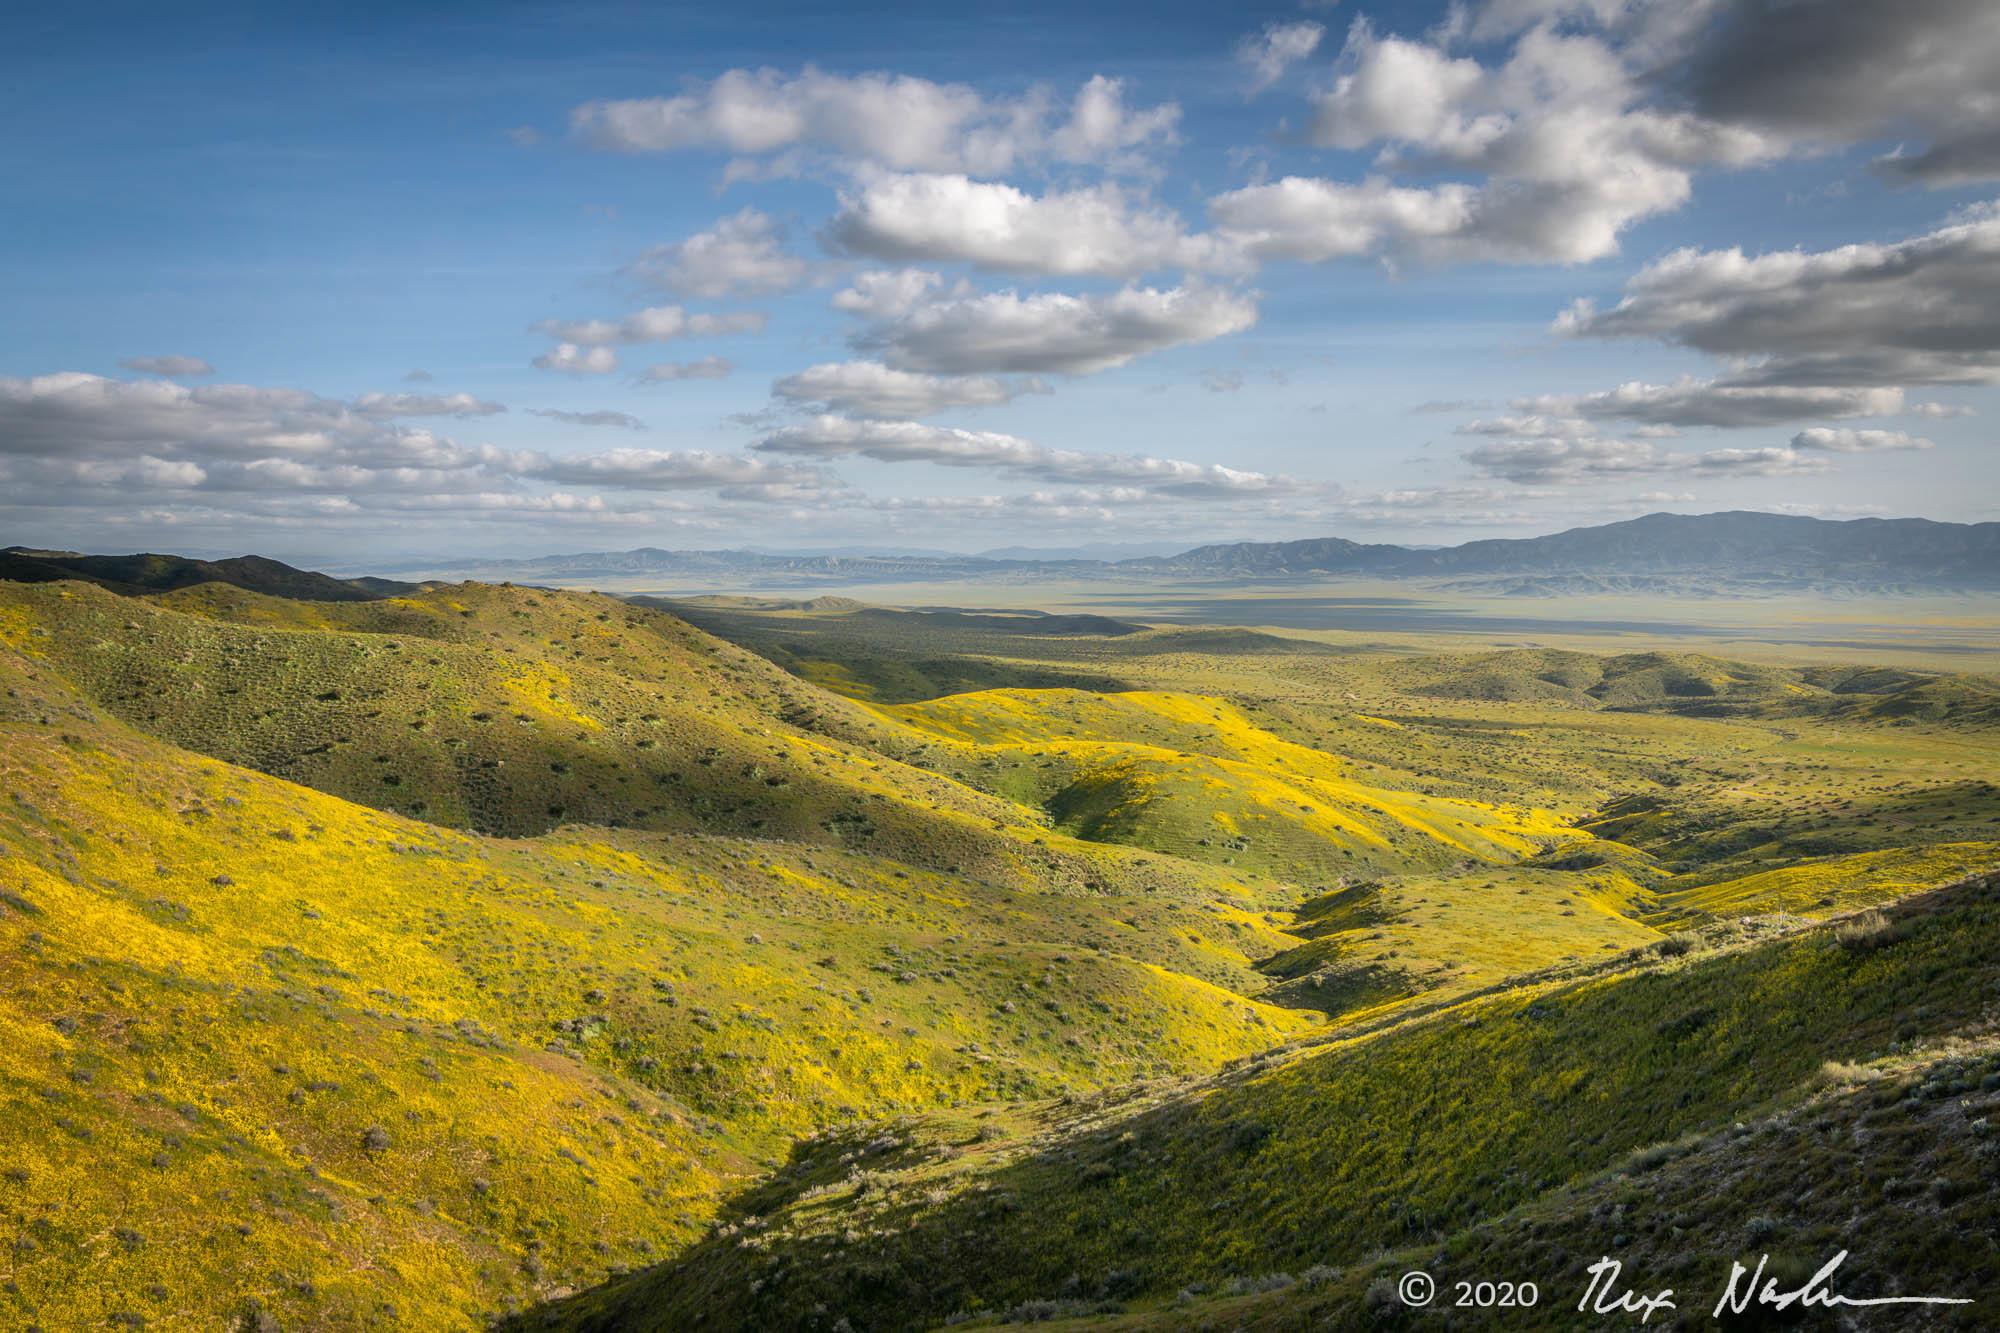 Amarillo - Carrizo Plain